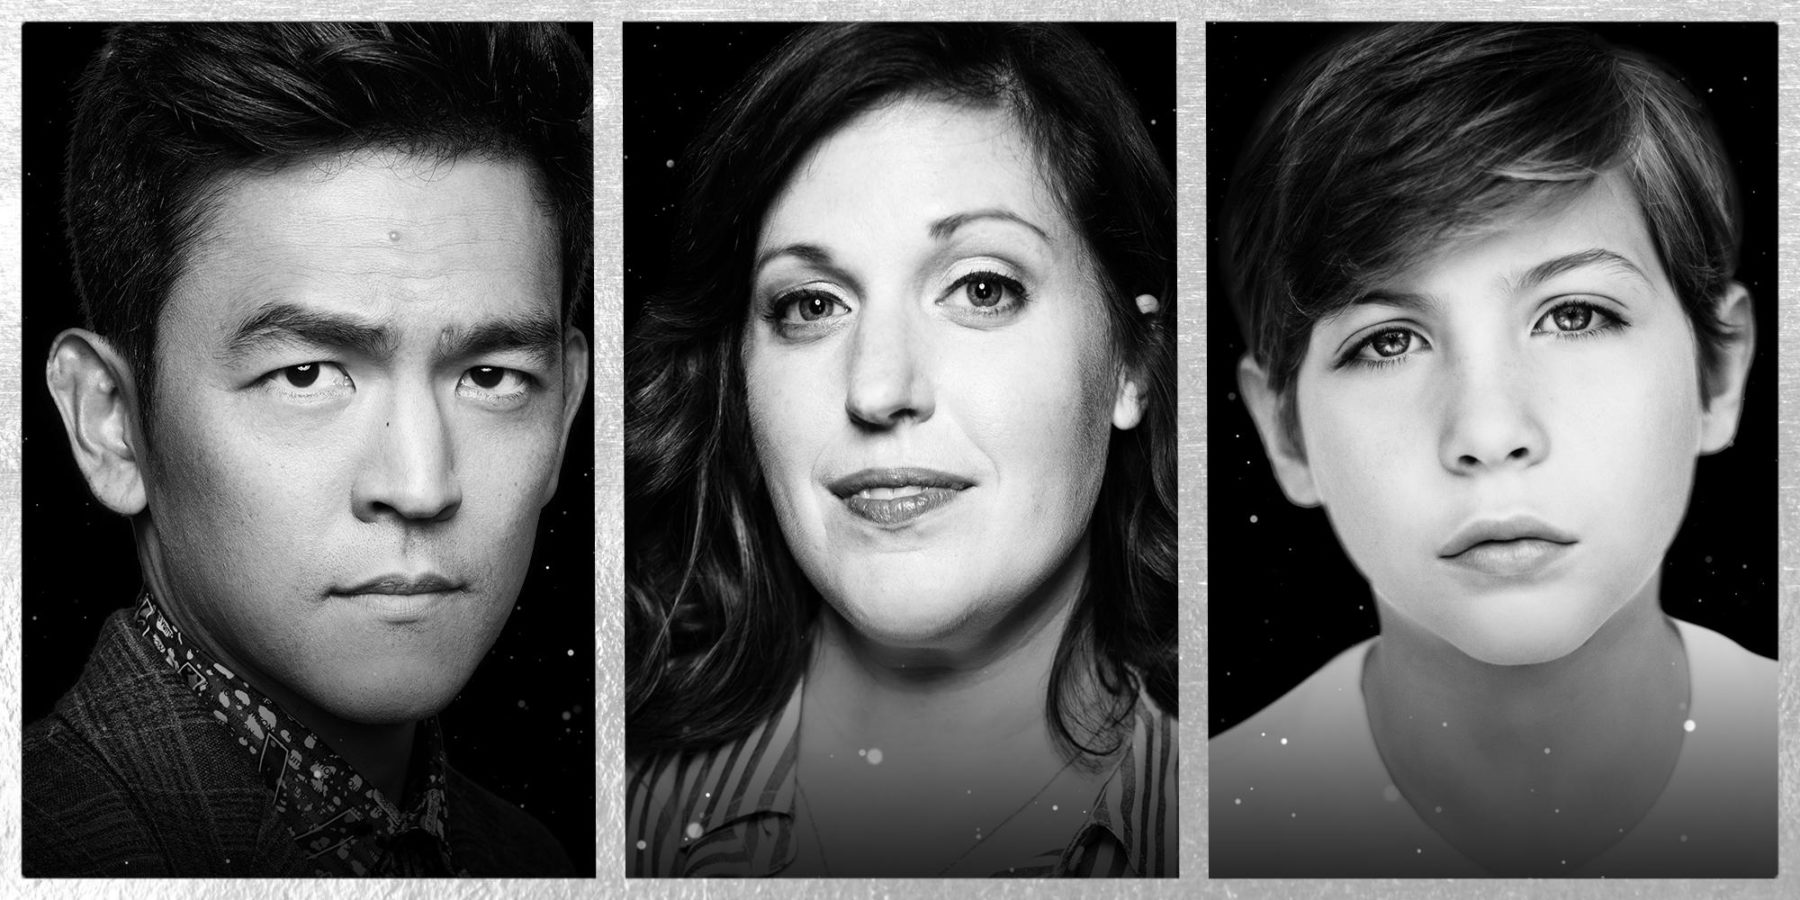 Twilight Zone de Jordan Peele ficha a John Cho, Allison Tolman y Jacob Tremblay para protagonizar episodio